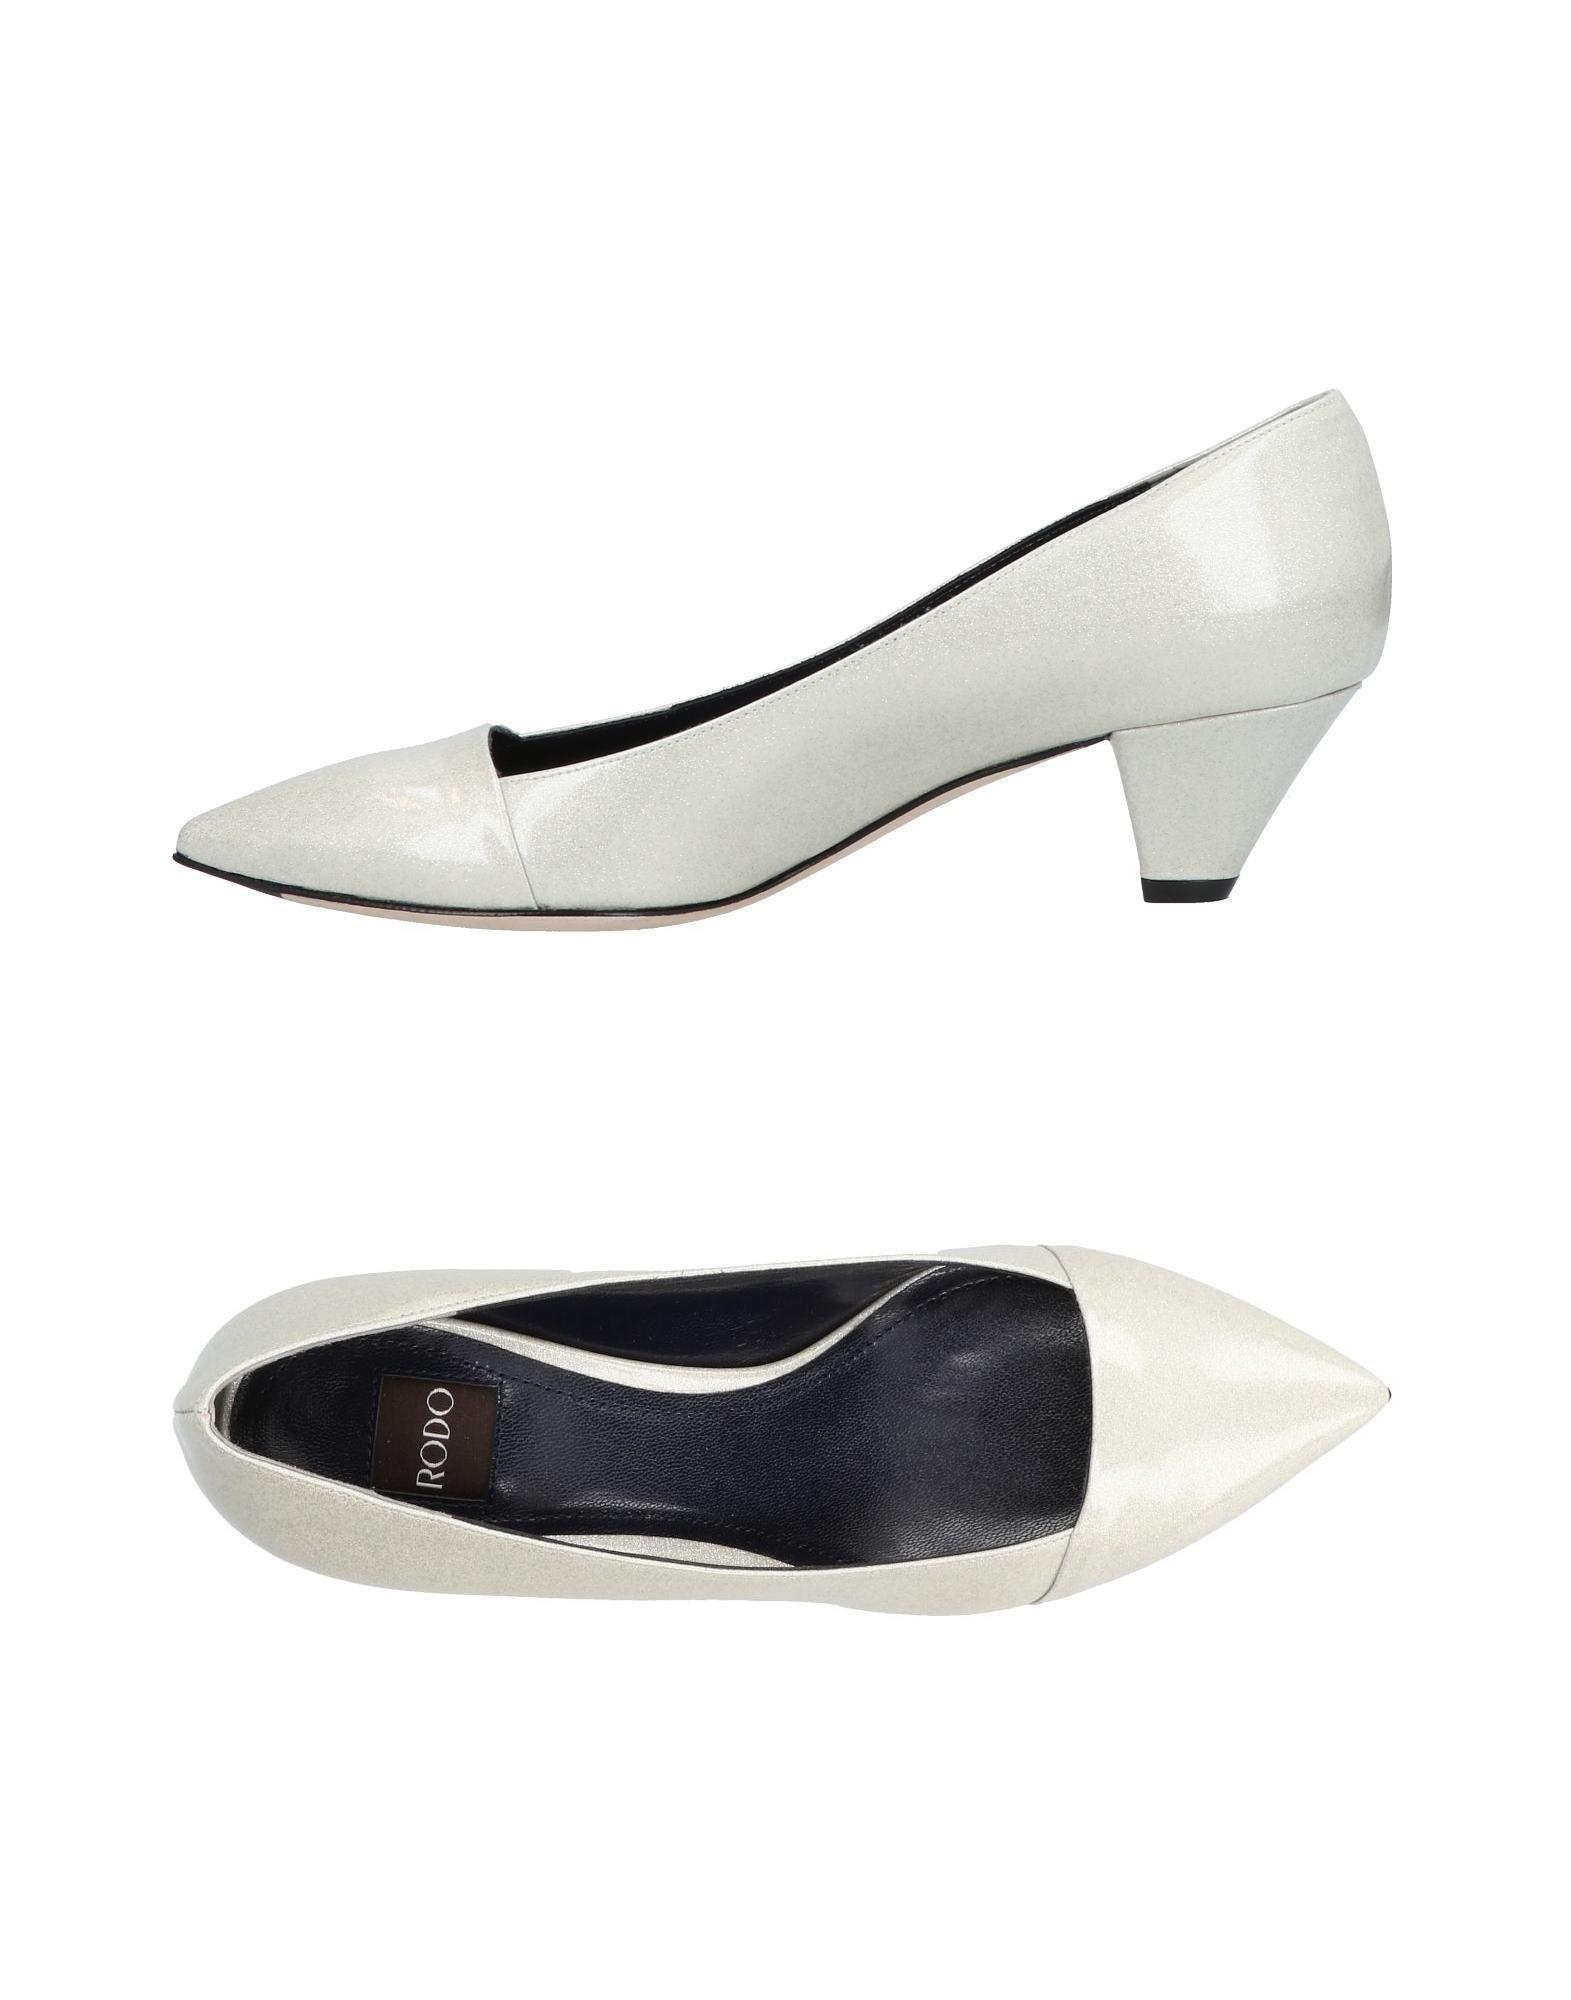 Stilvolle billige Schuhe Rodo Pumps 11450568MB Damen  11450568MB Pumps 5eeb99